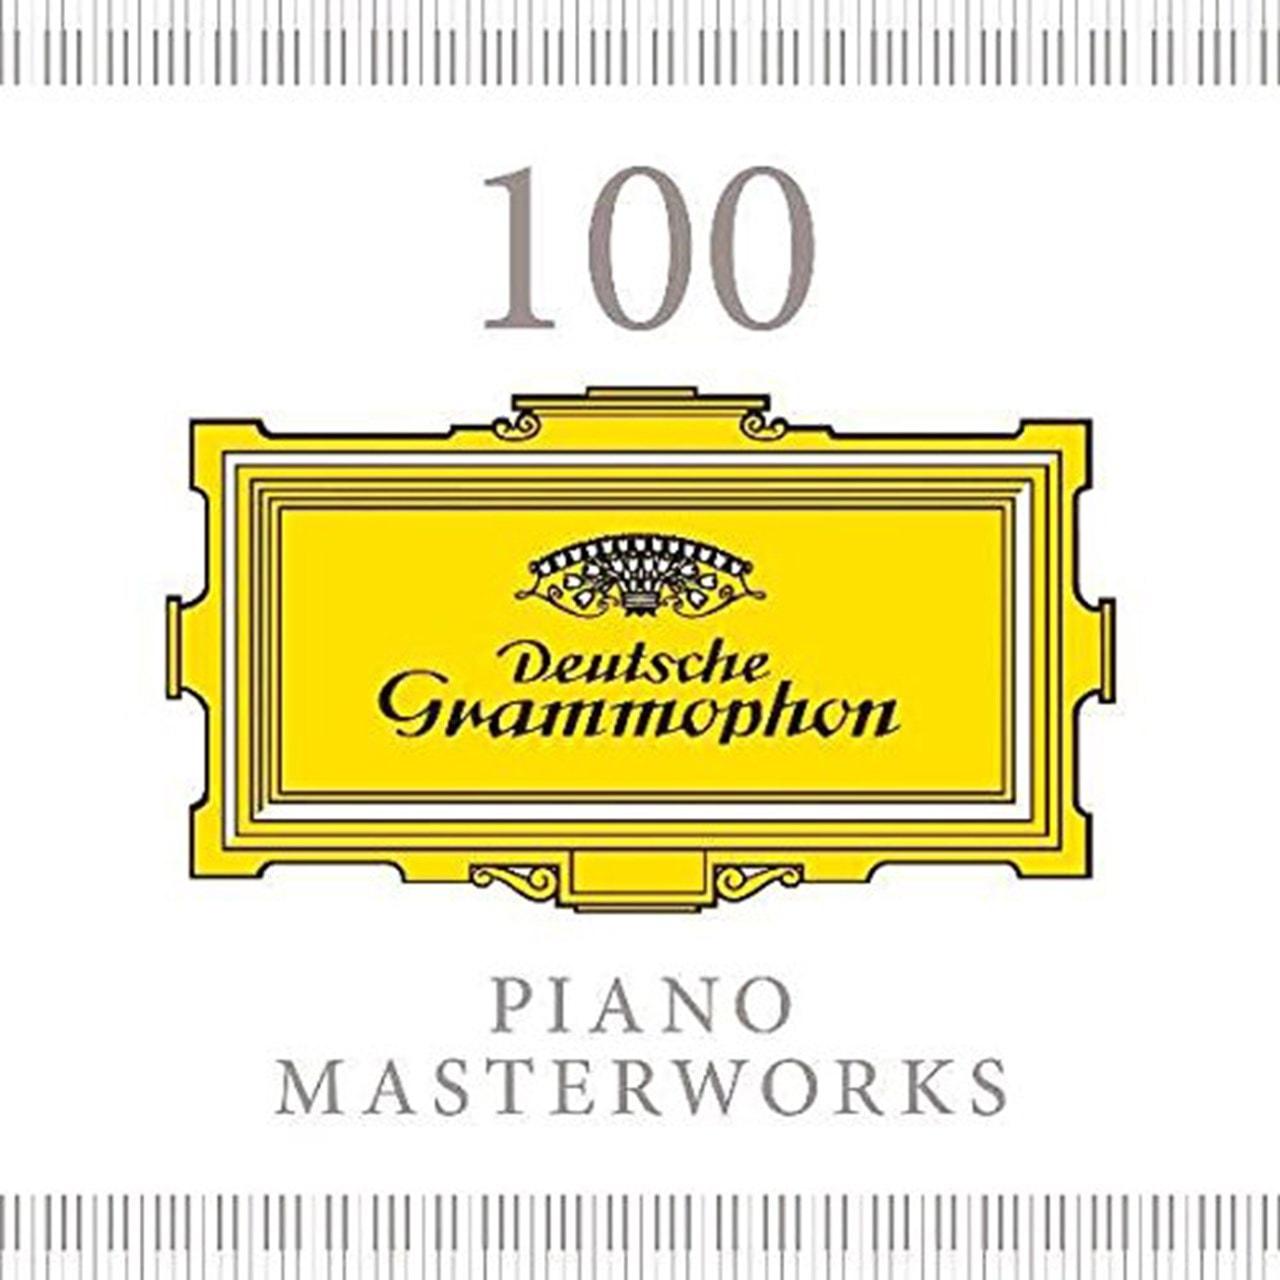 100 Piano Masterworks - 1